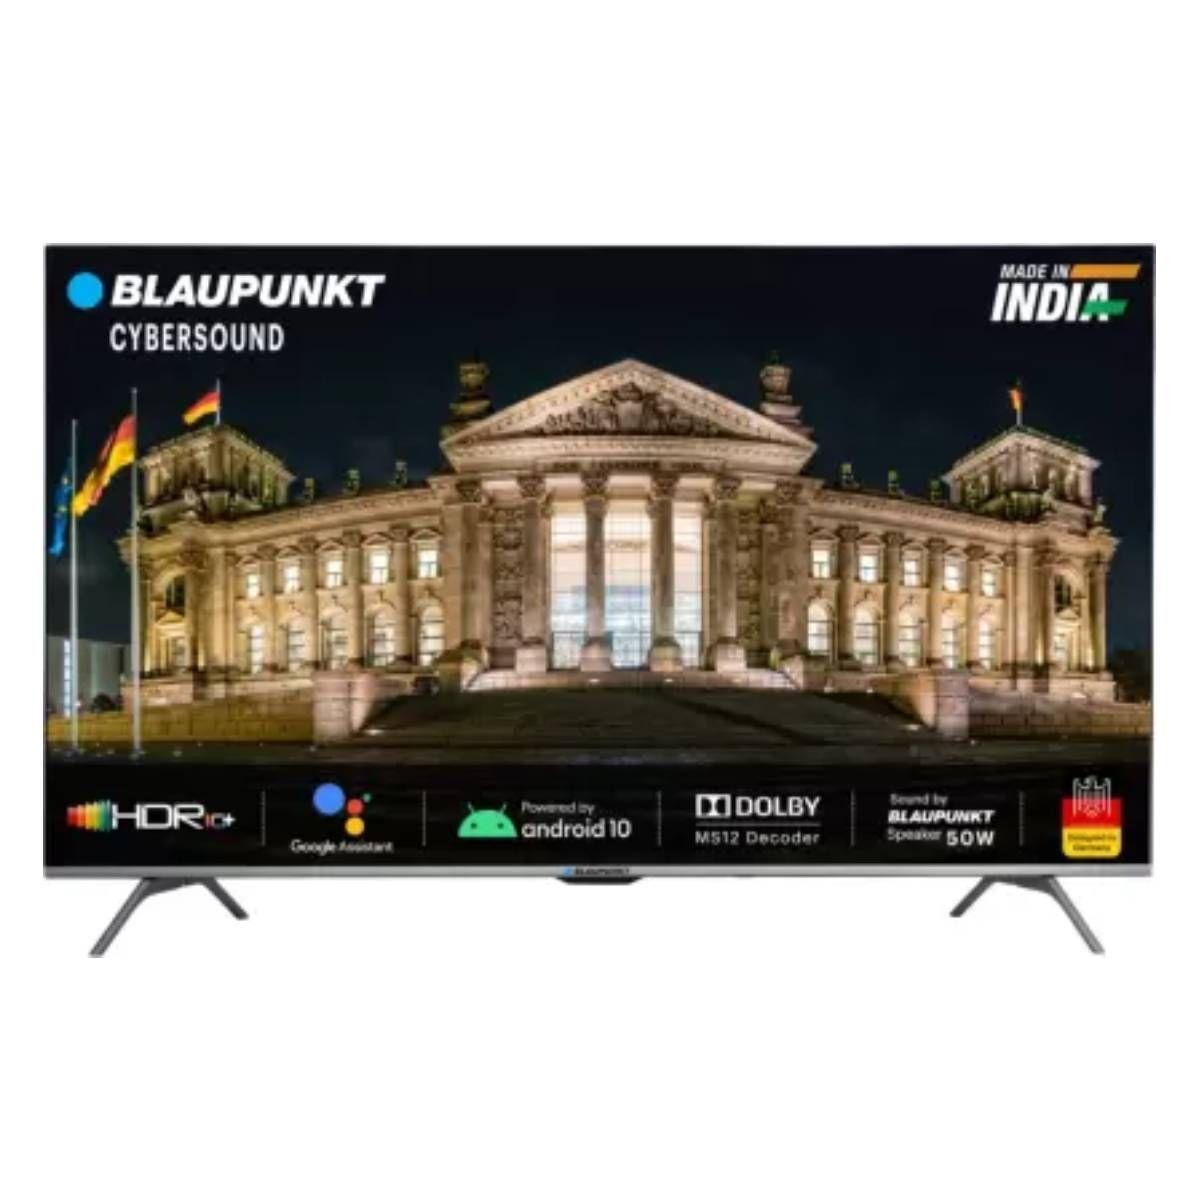 Blaupunkt Cybersound 43 inch 4K LED  TV